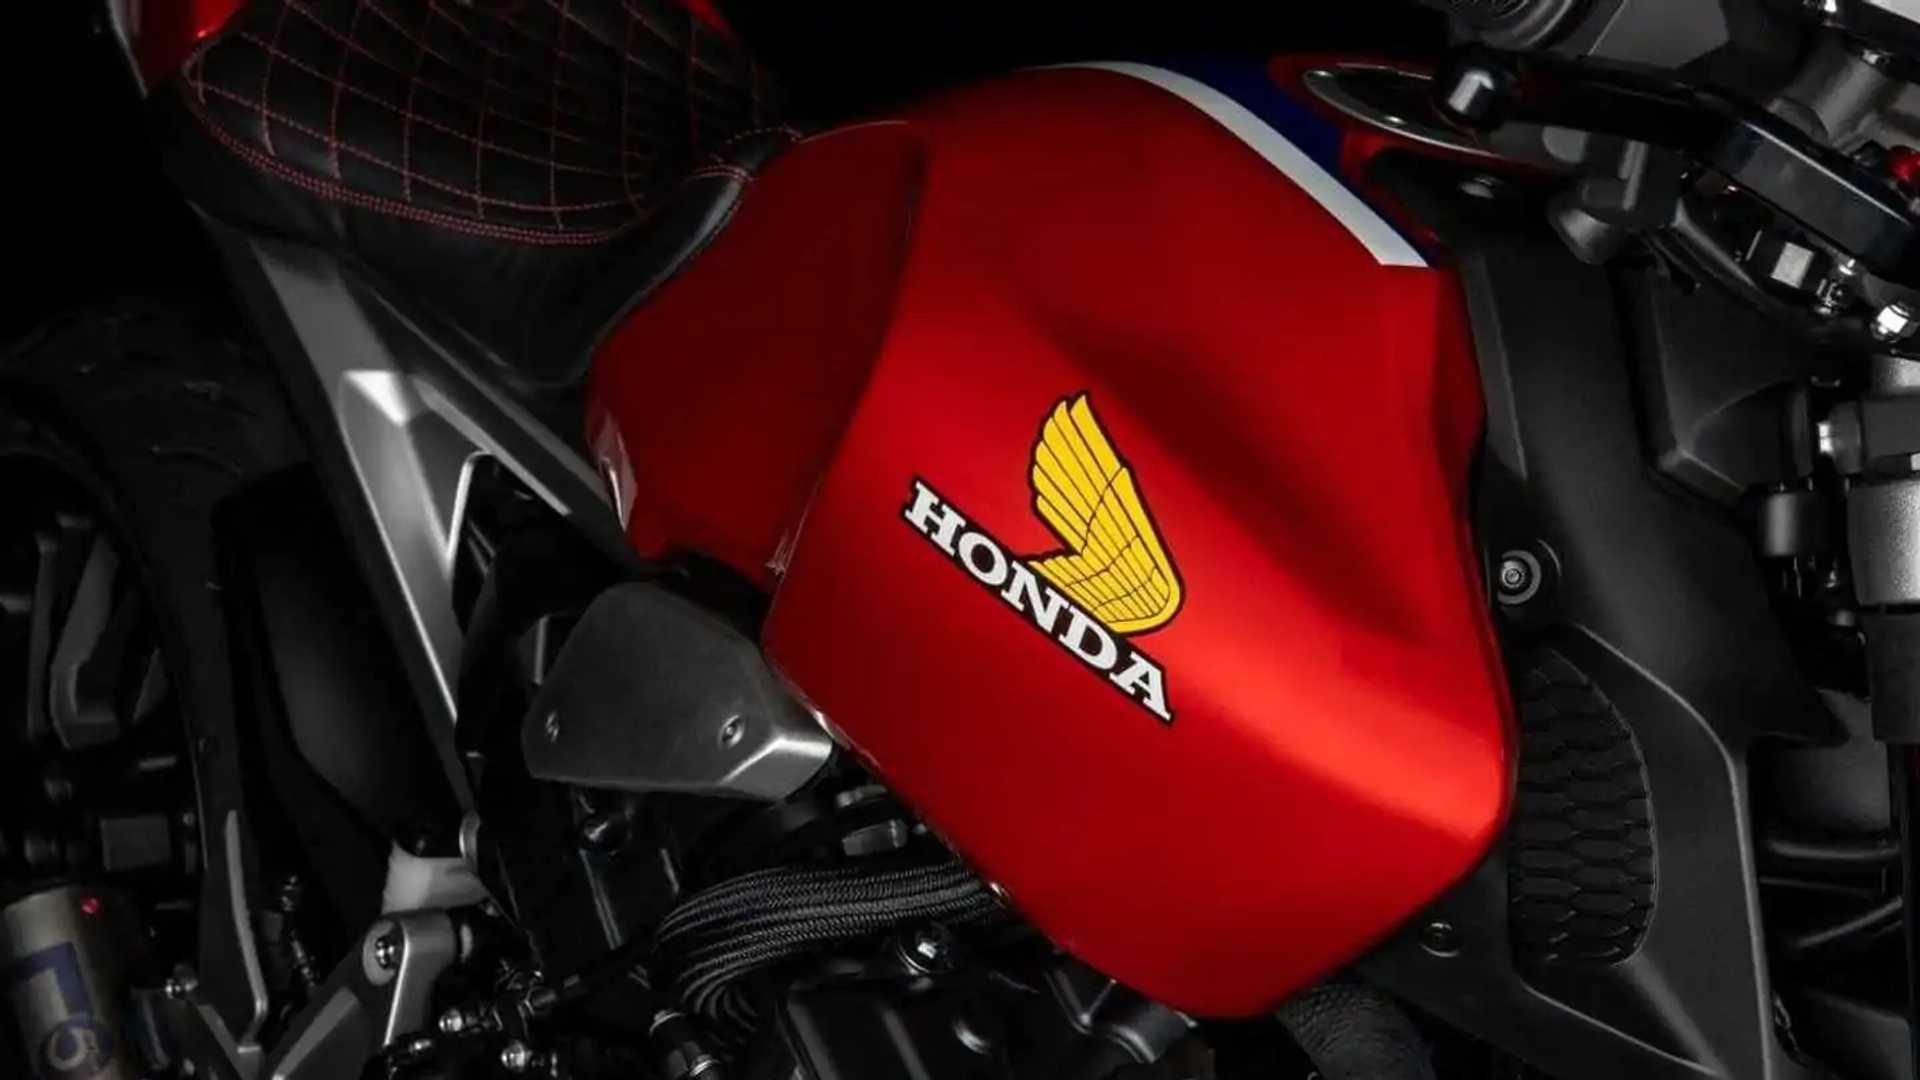 2021 Honda CB1000R 5Four - Tank, Side